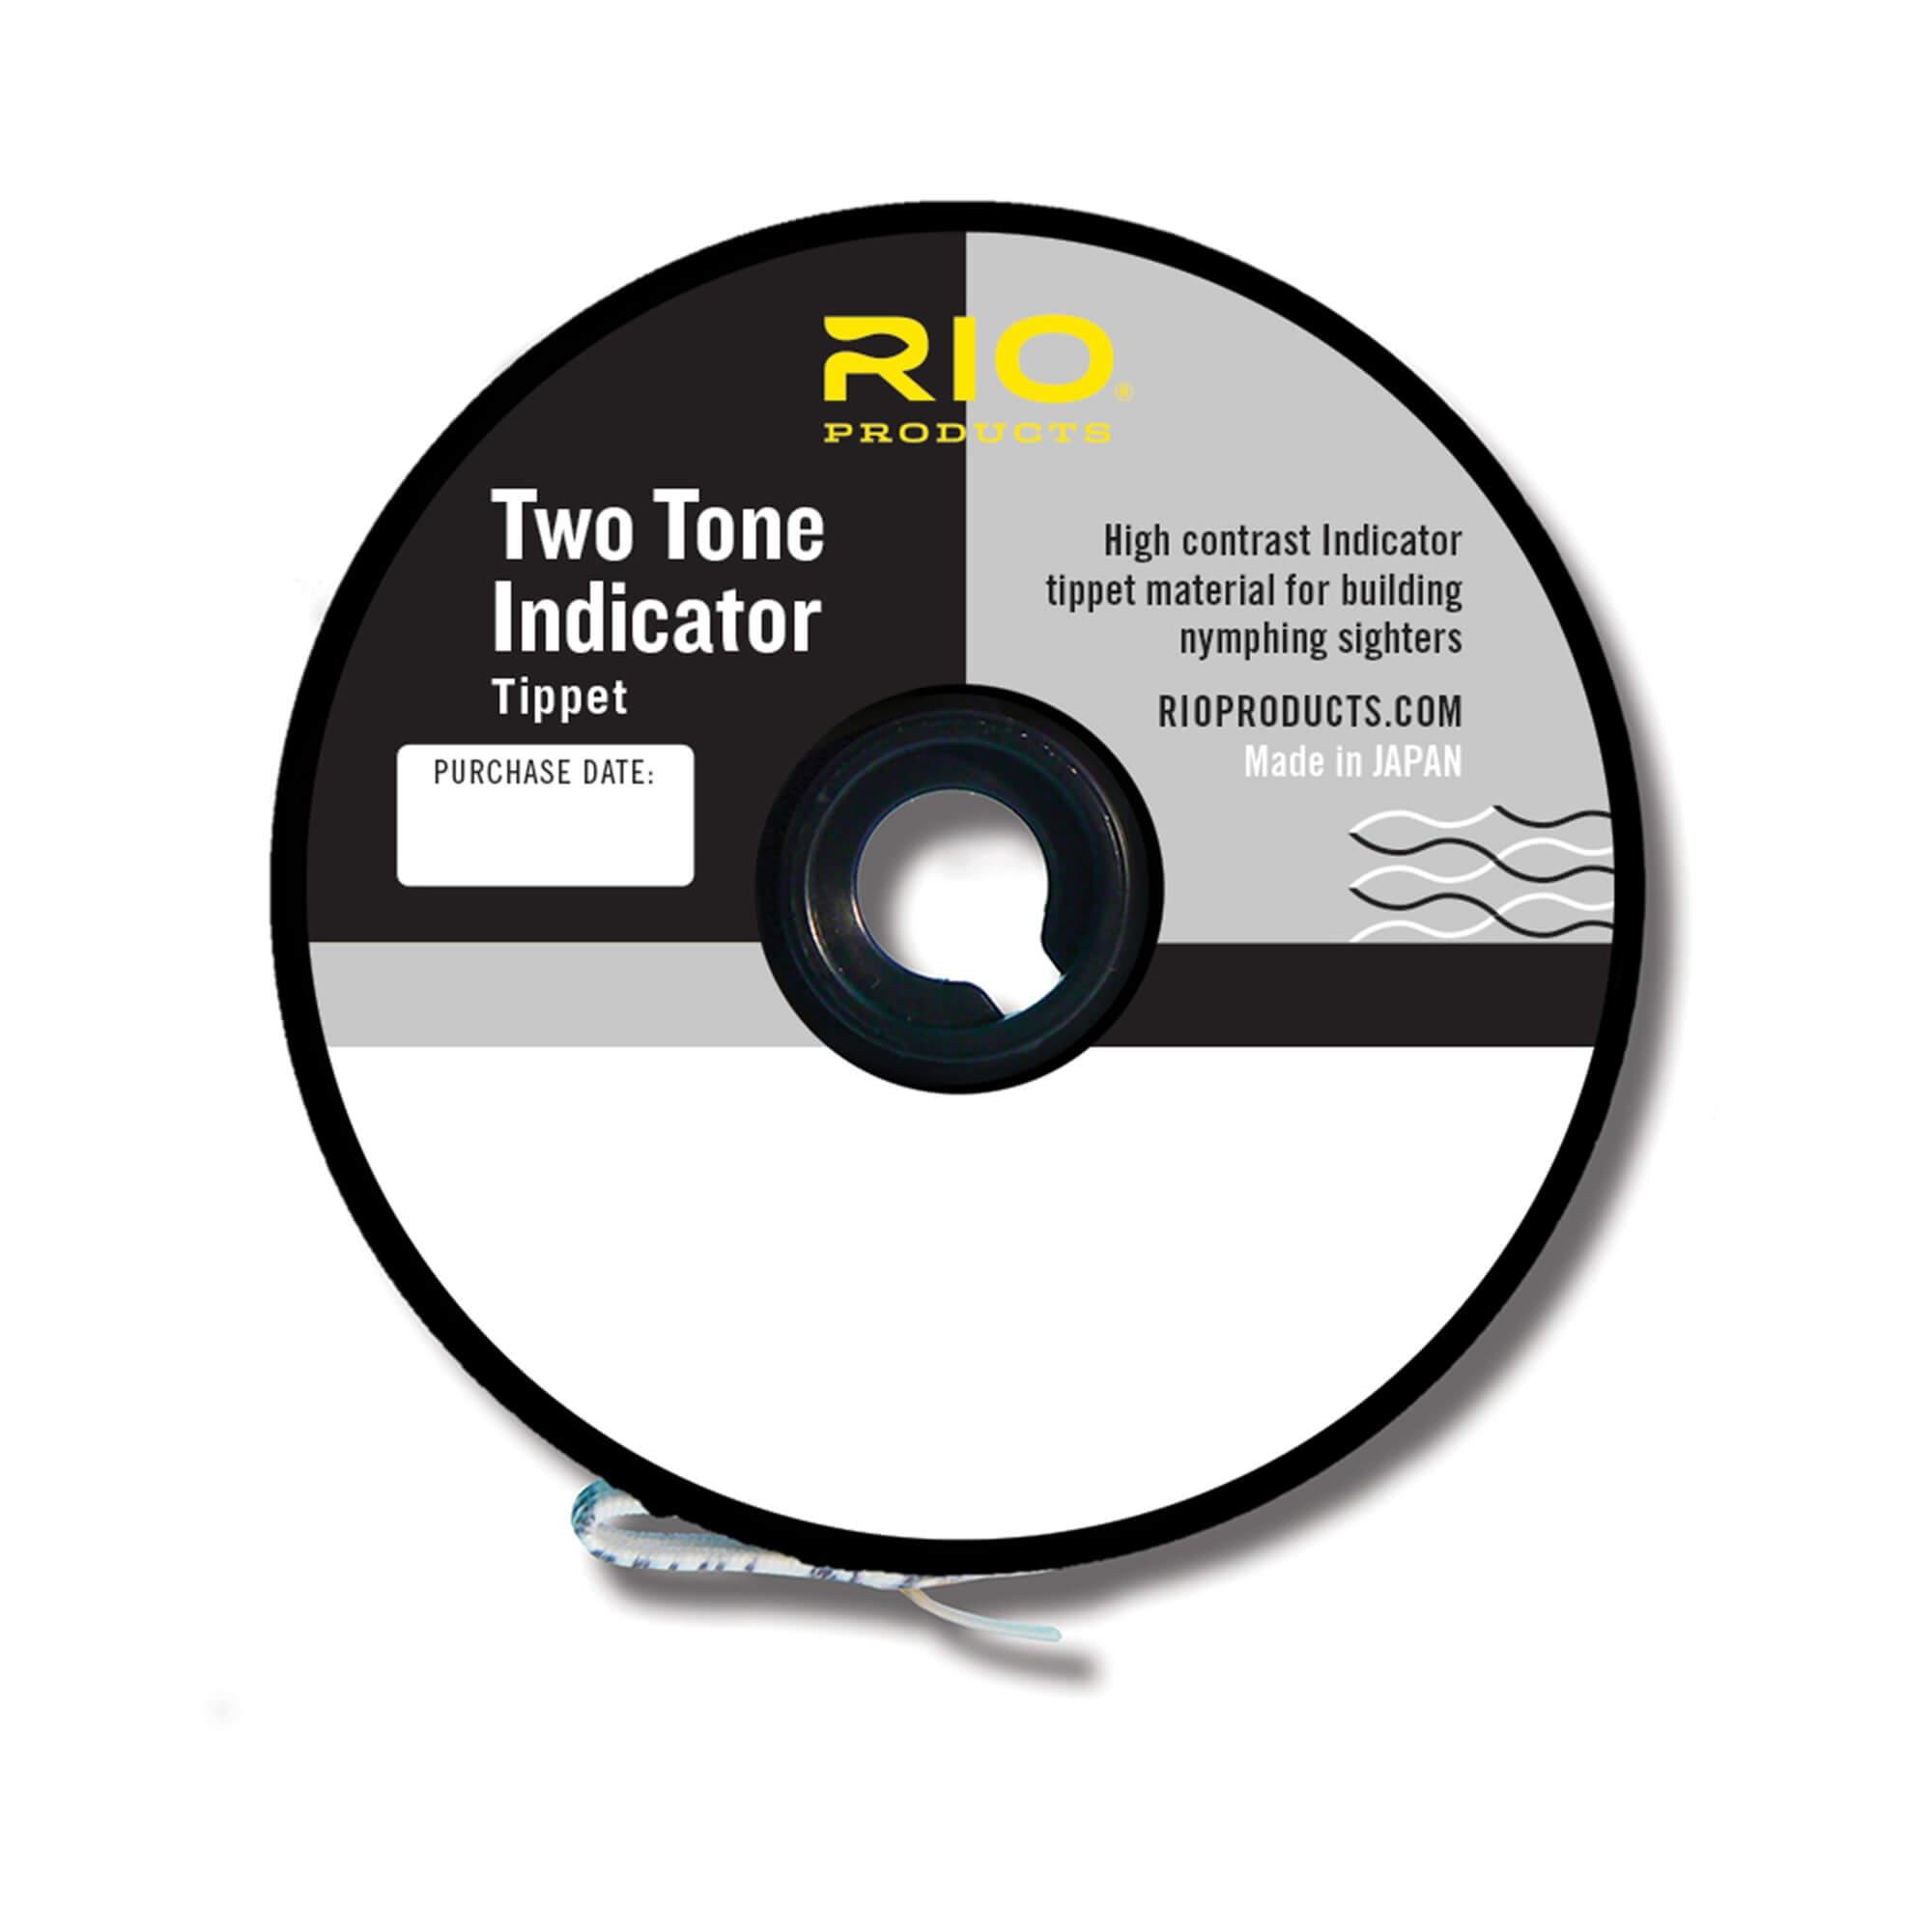 2-Tone Indicator Tippet